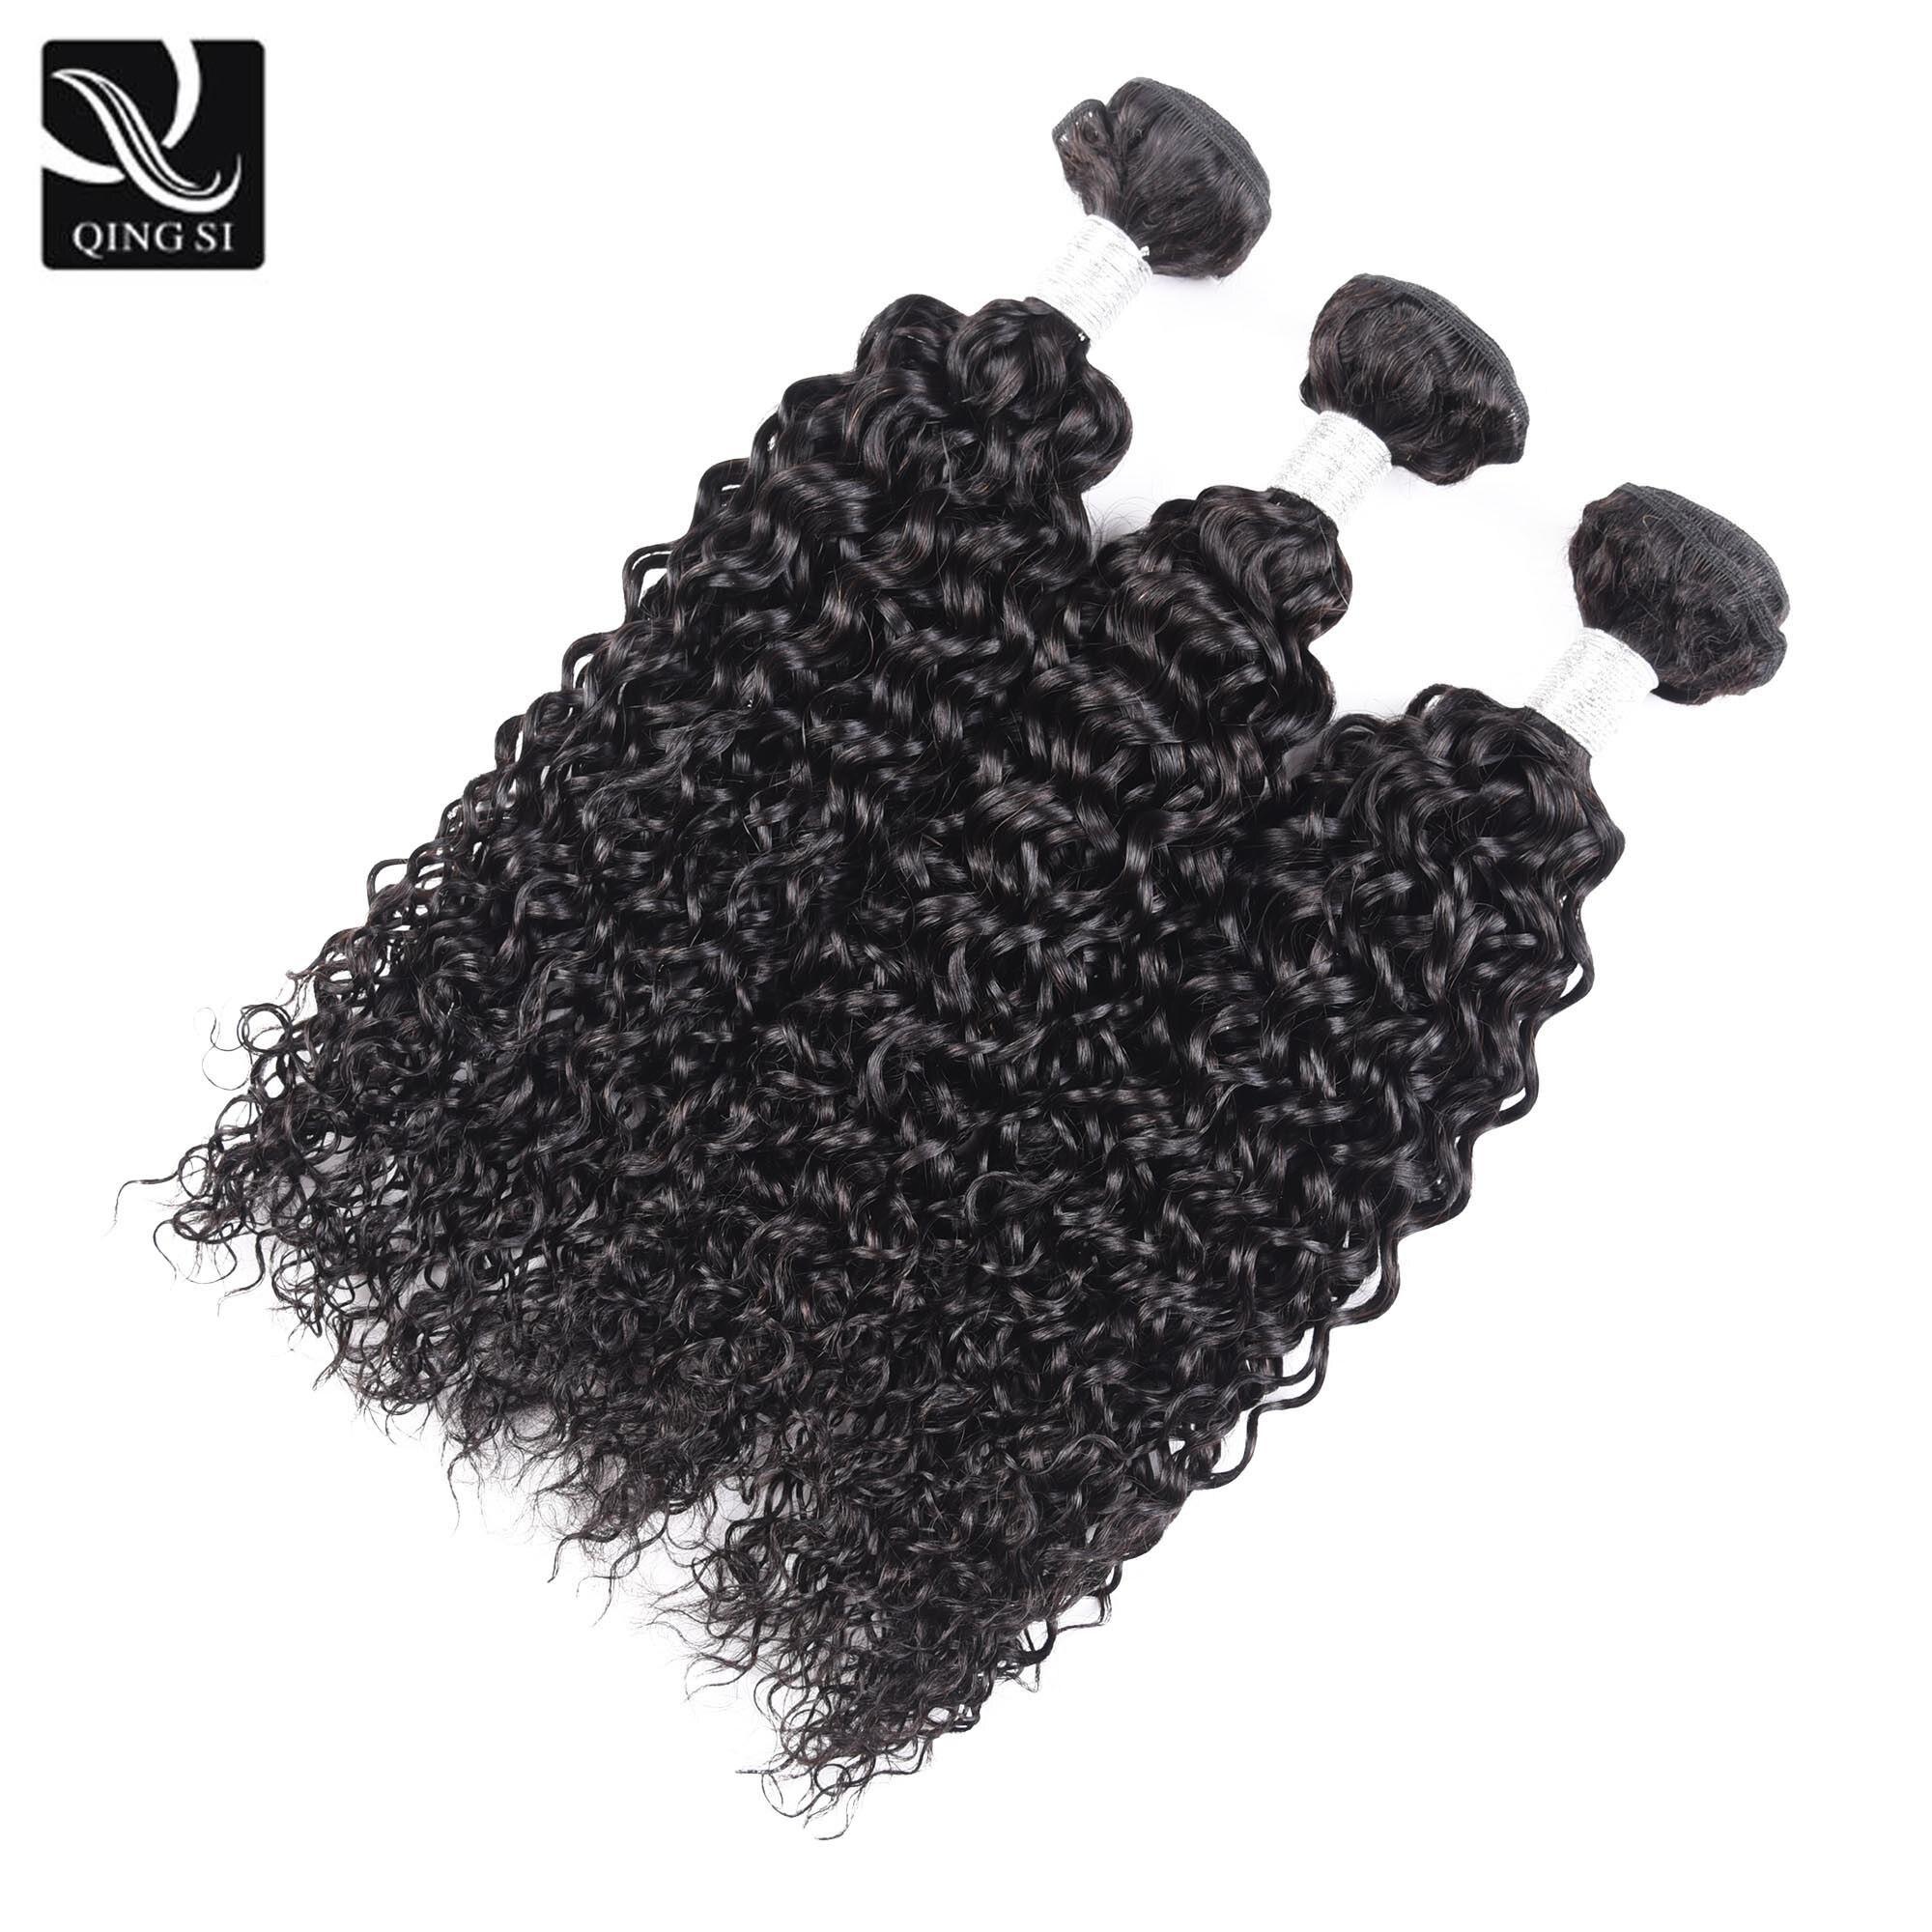 Curly Human Hair Bundles Brazilian Hair Weave Bundles Deals 100% Remy Curly Bundles Afro Kinky Curly Hair Extension 3 Bundle